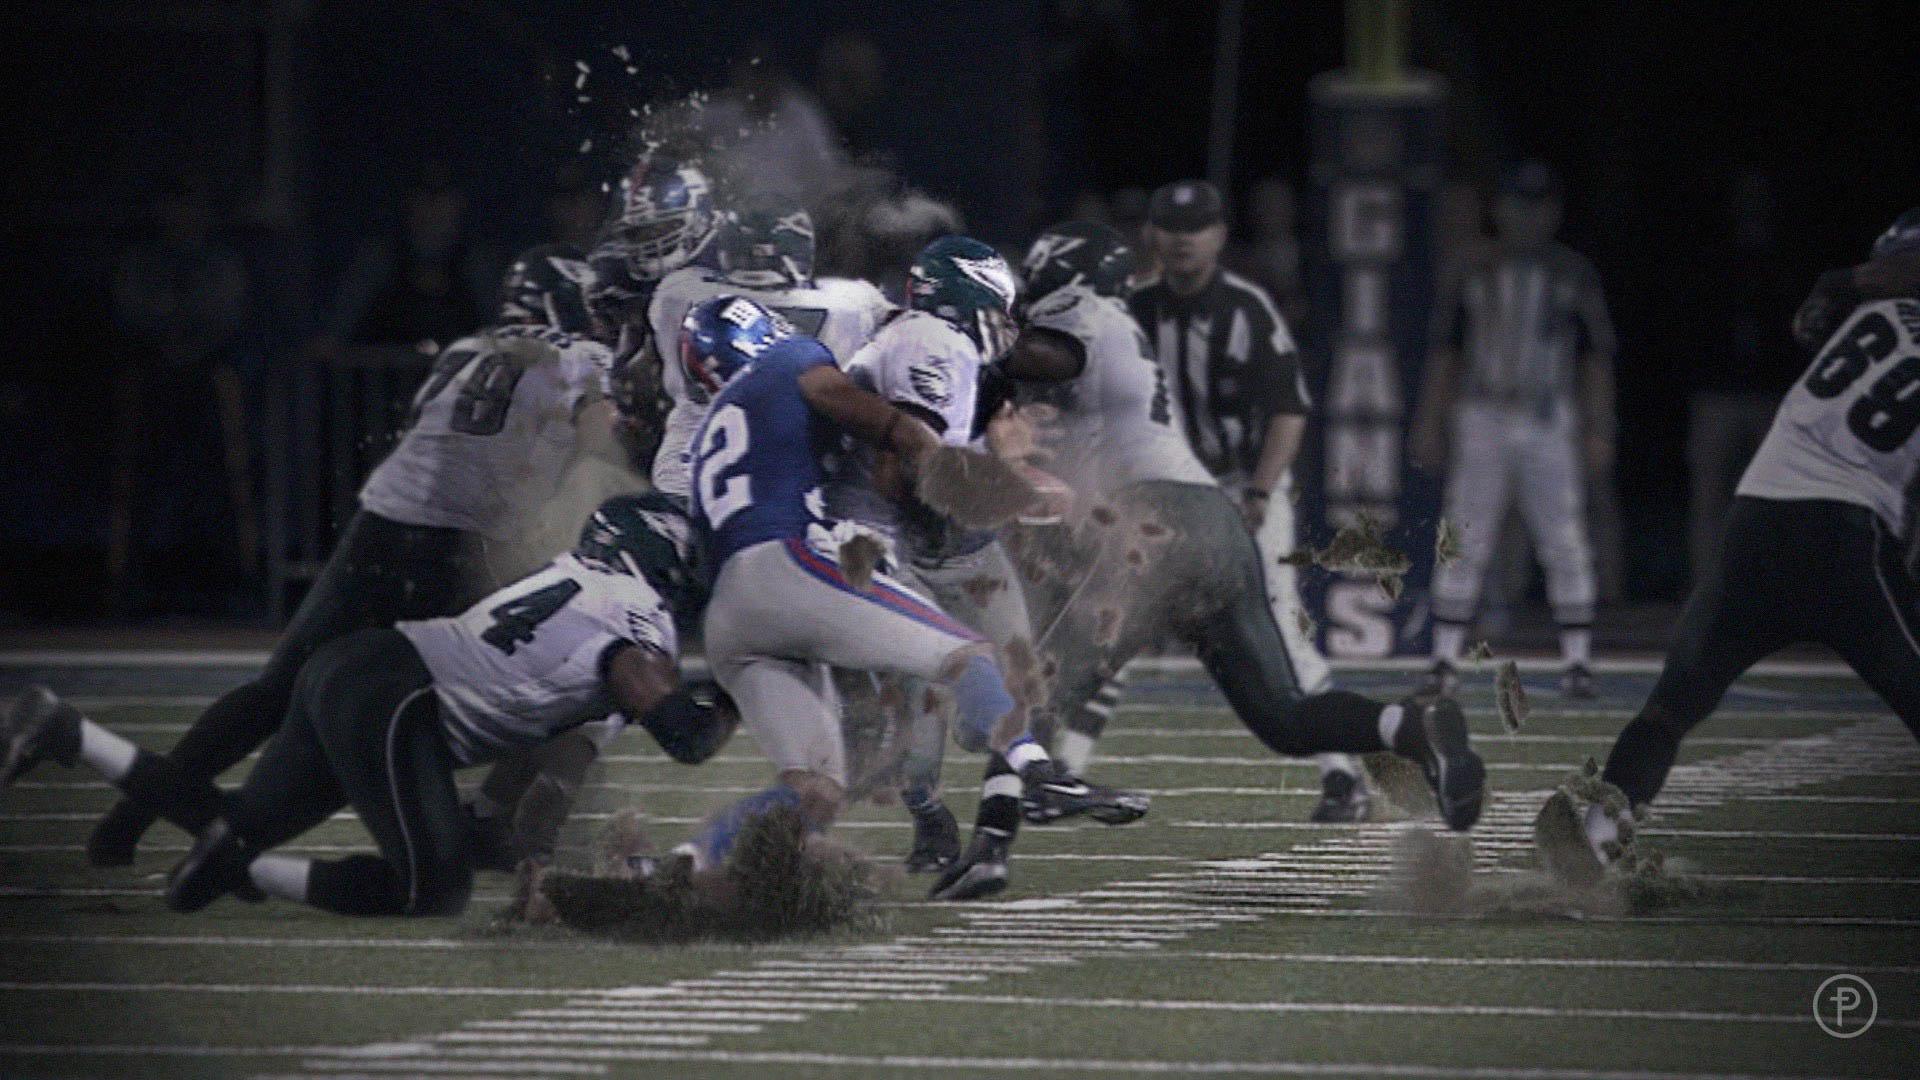 Zai_Ortiz_NBC_Football_-13.jpg